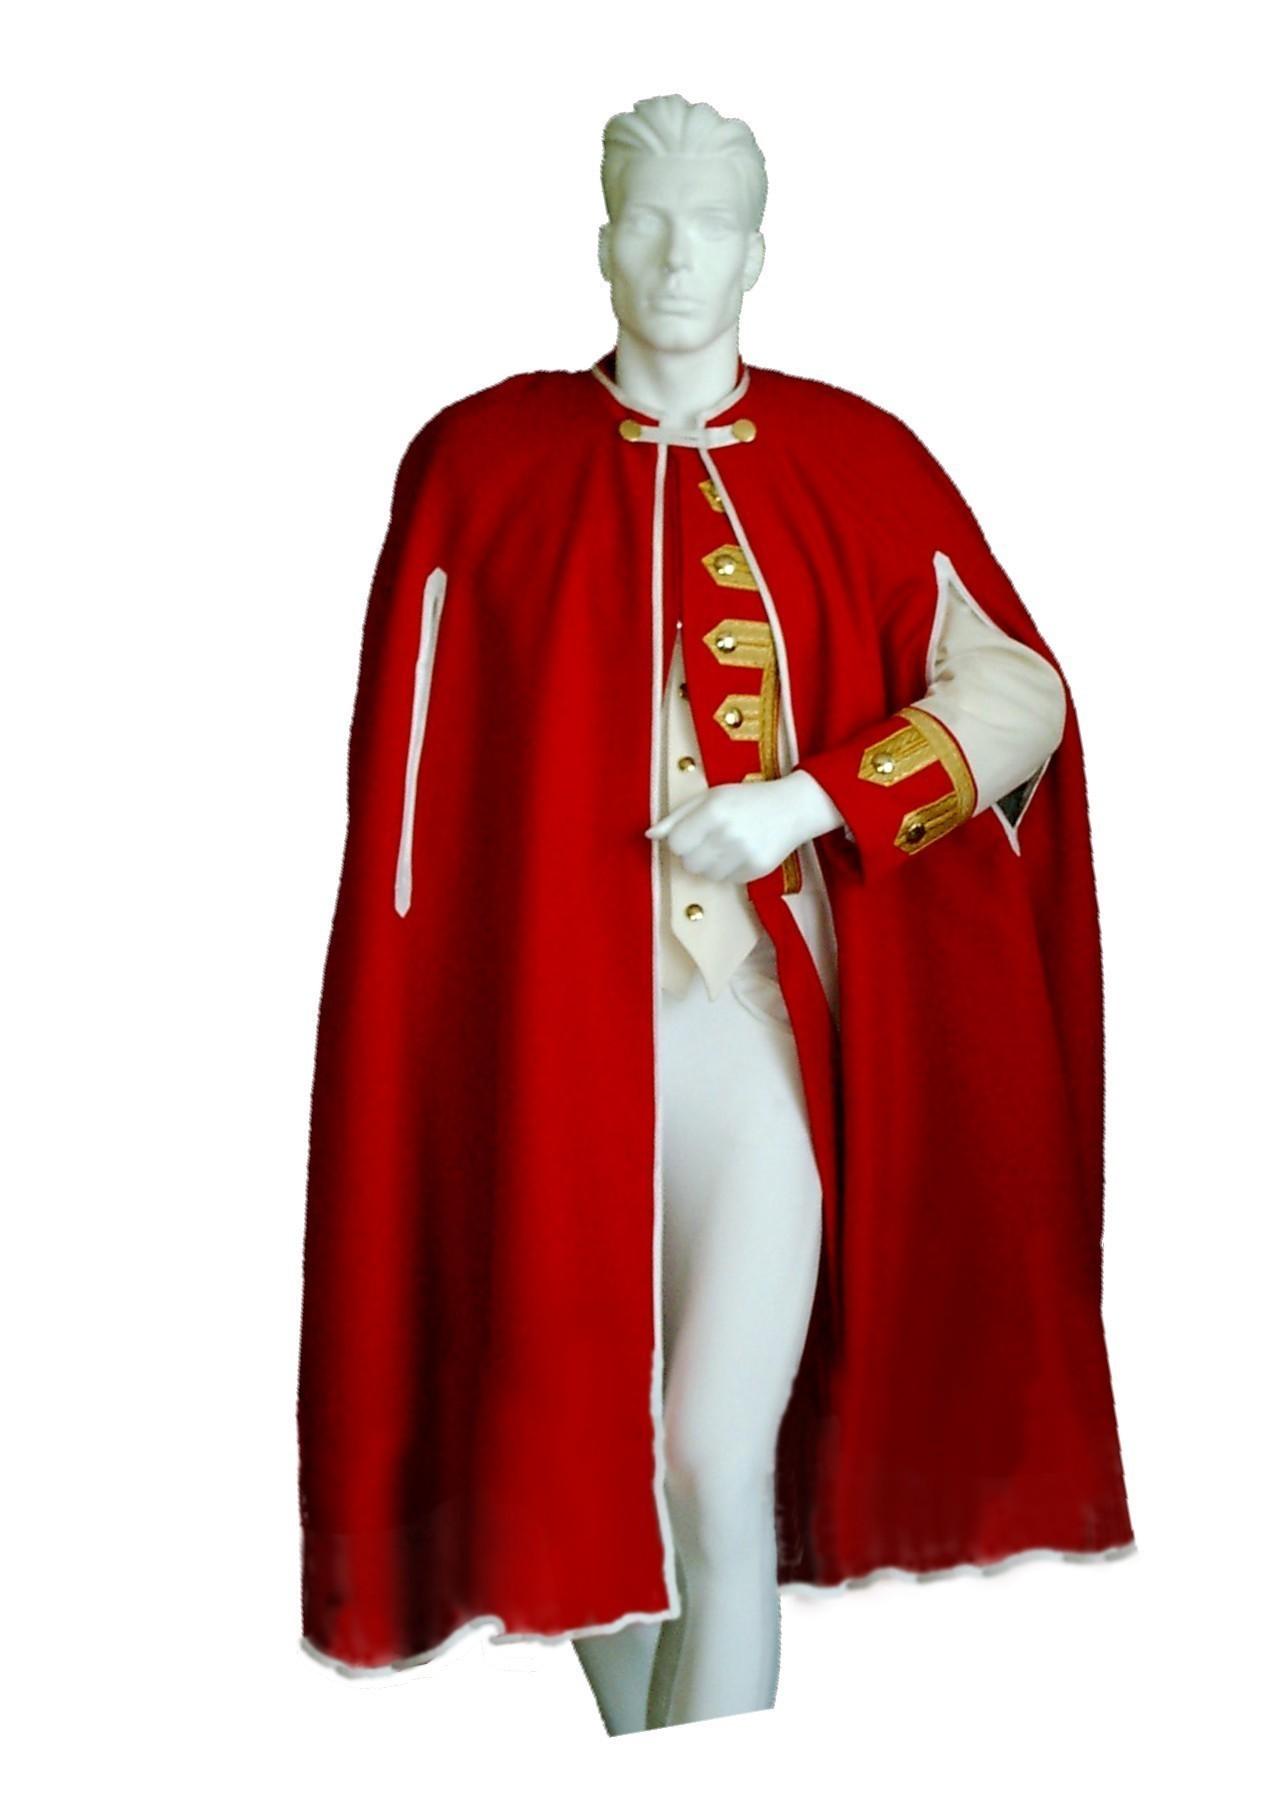 Bajazzokarneval De Gardeumhang Gardeumhange Cape Poncho Uniform